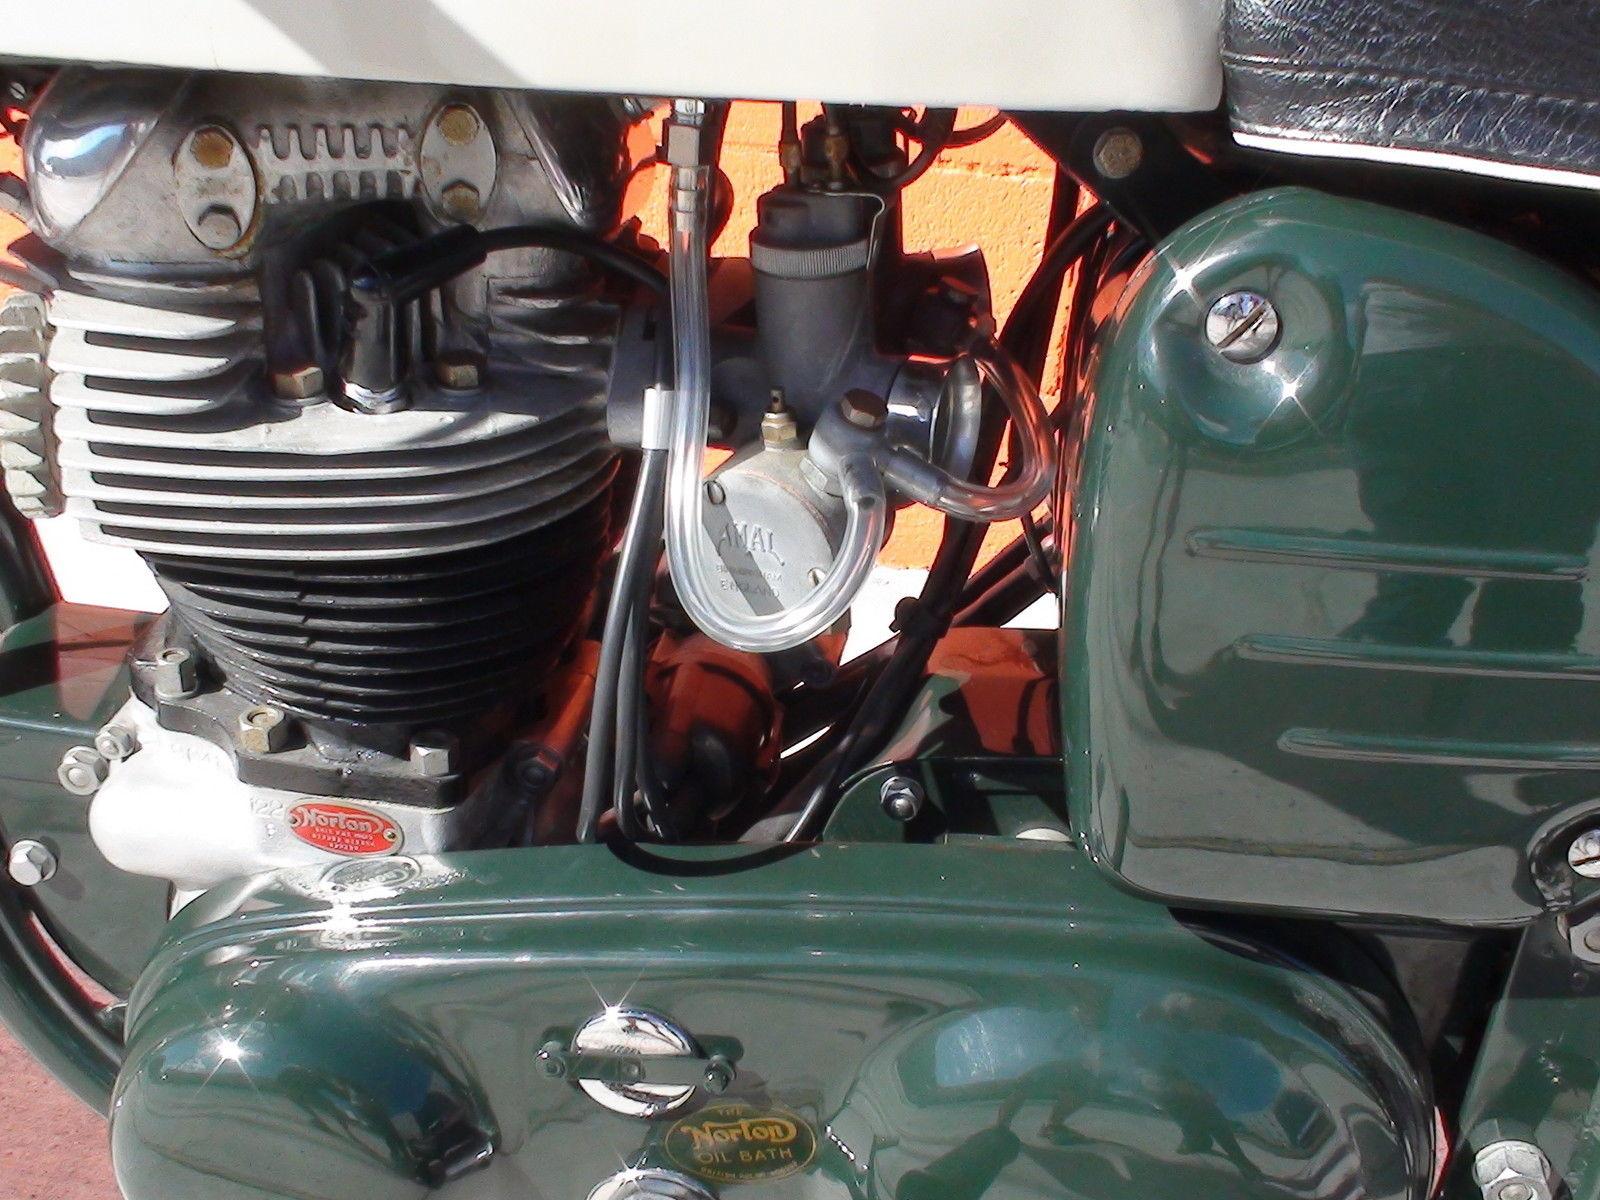 Norton Dominator 88 - 1960 - Carburettors, Side Cover and Cylinder.